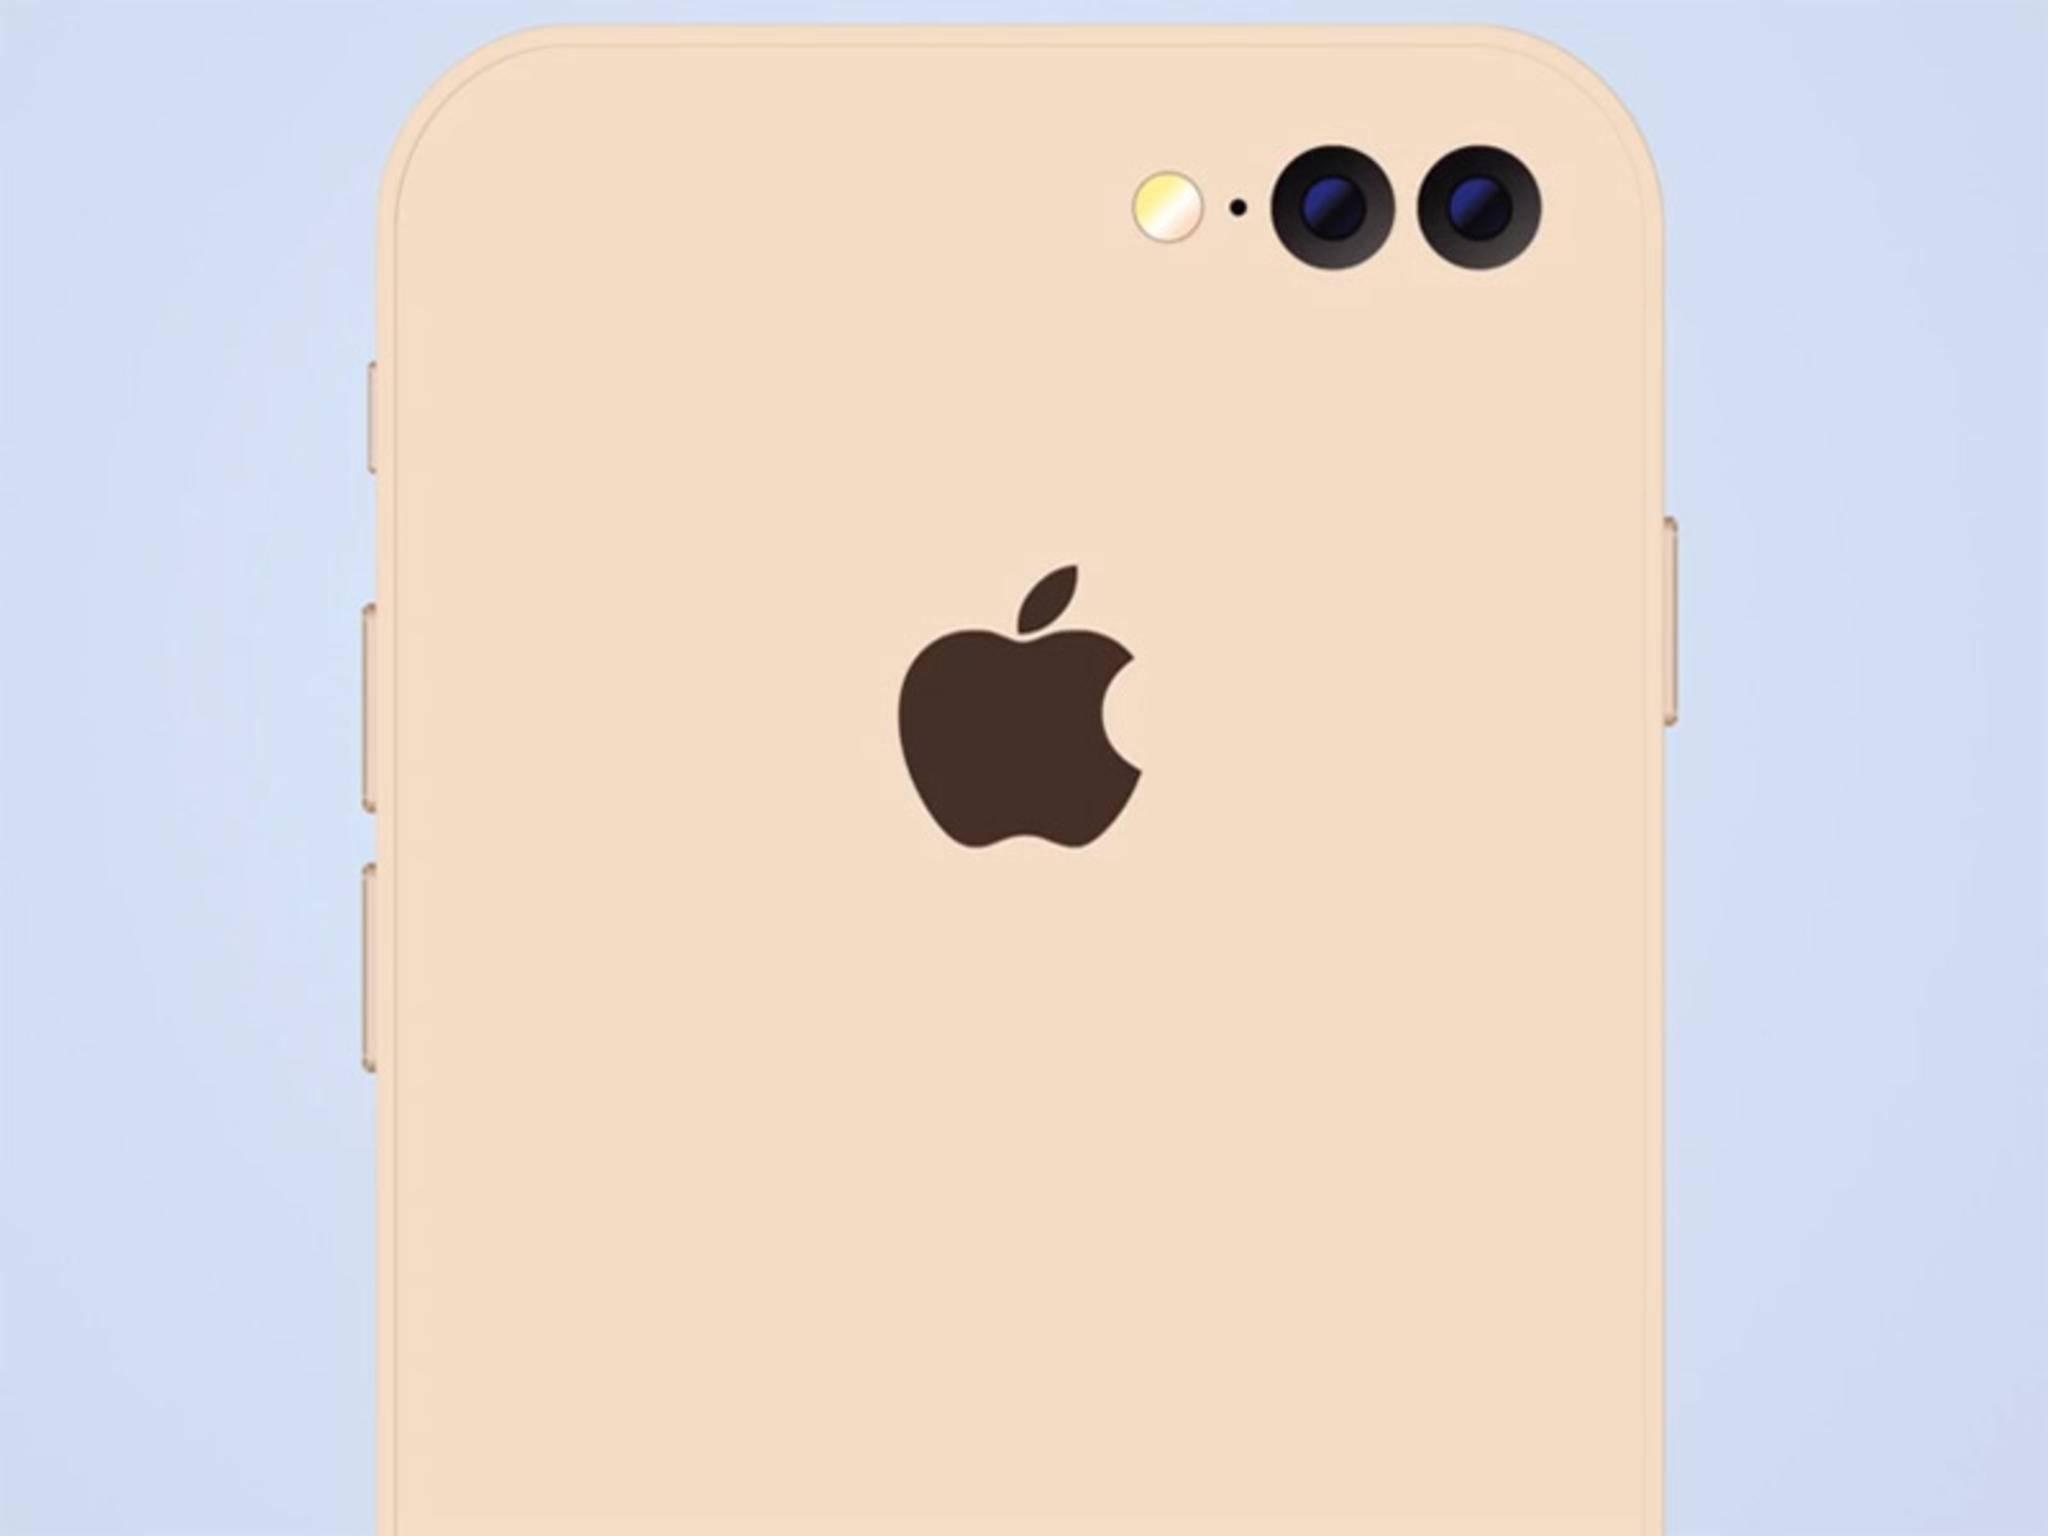 Bekommt nur das iPhone 7 Plus eine Dual-Kamera?